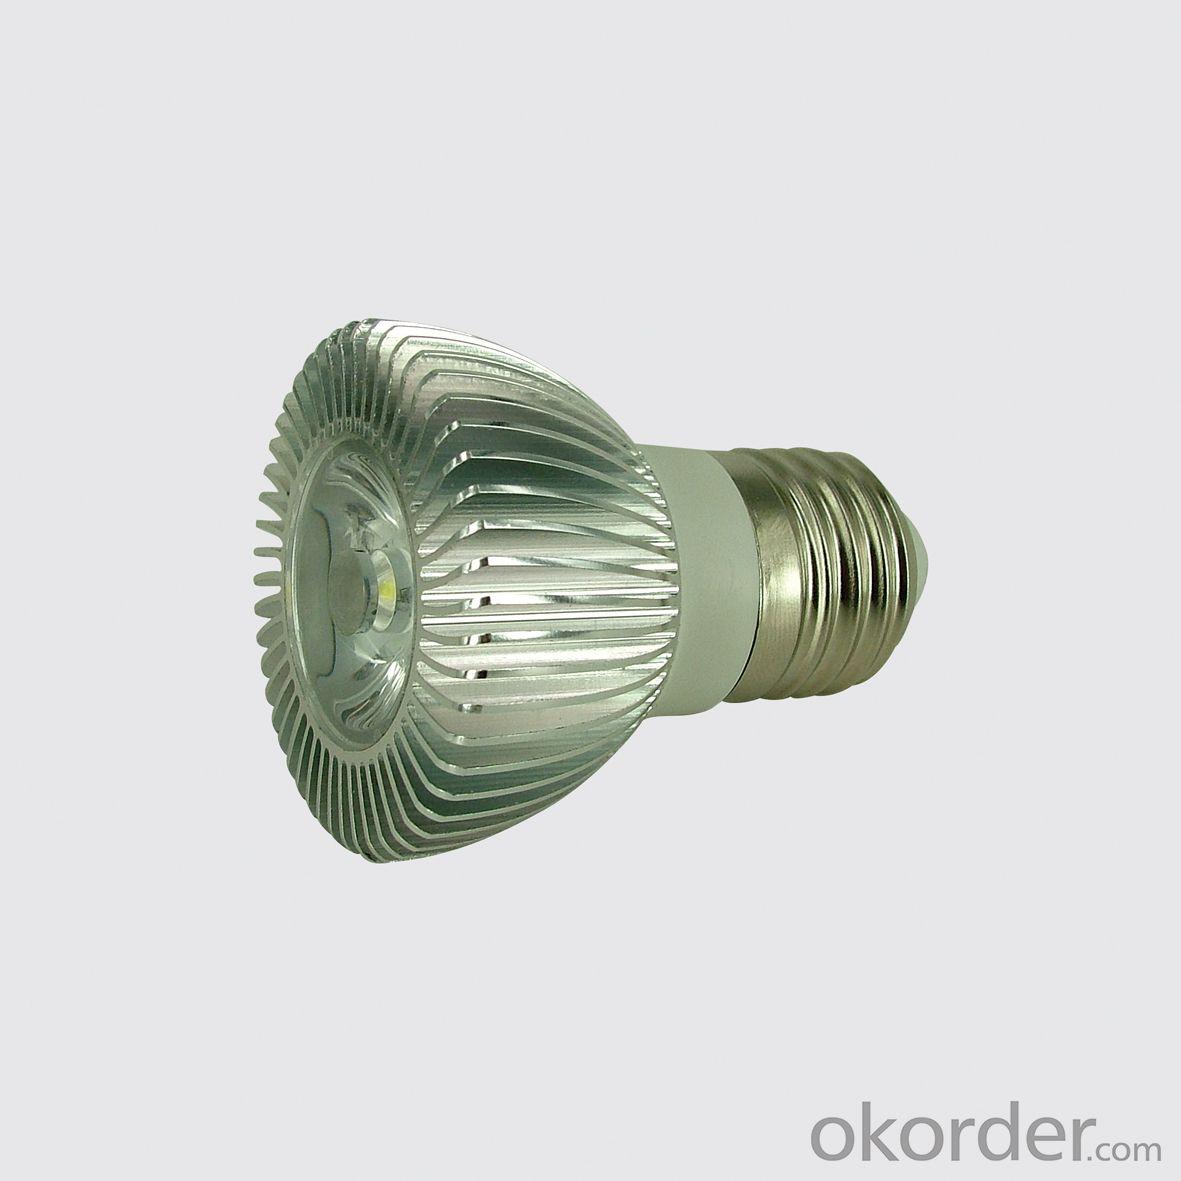 buy etl ce reflection cup light 16w par38 spot led e27 e26 gu10 price size weight model width. Black Bedroom Furniture Sets. Home Design Ideas